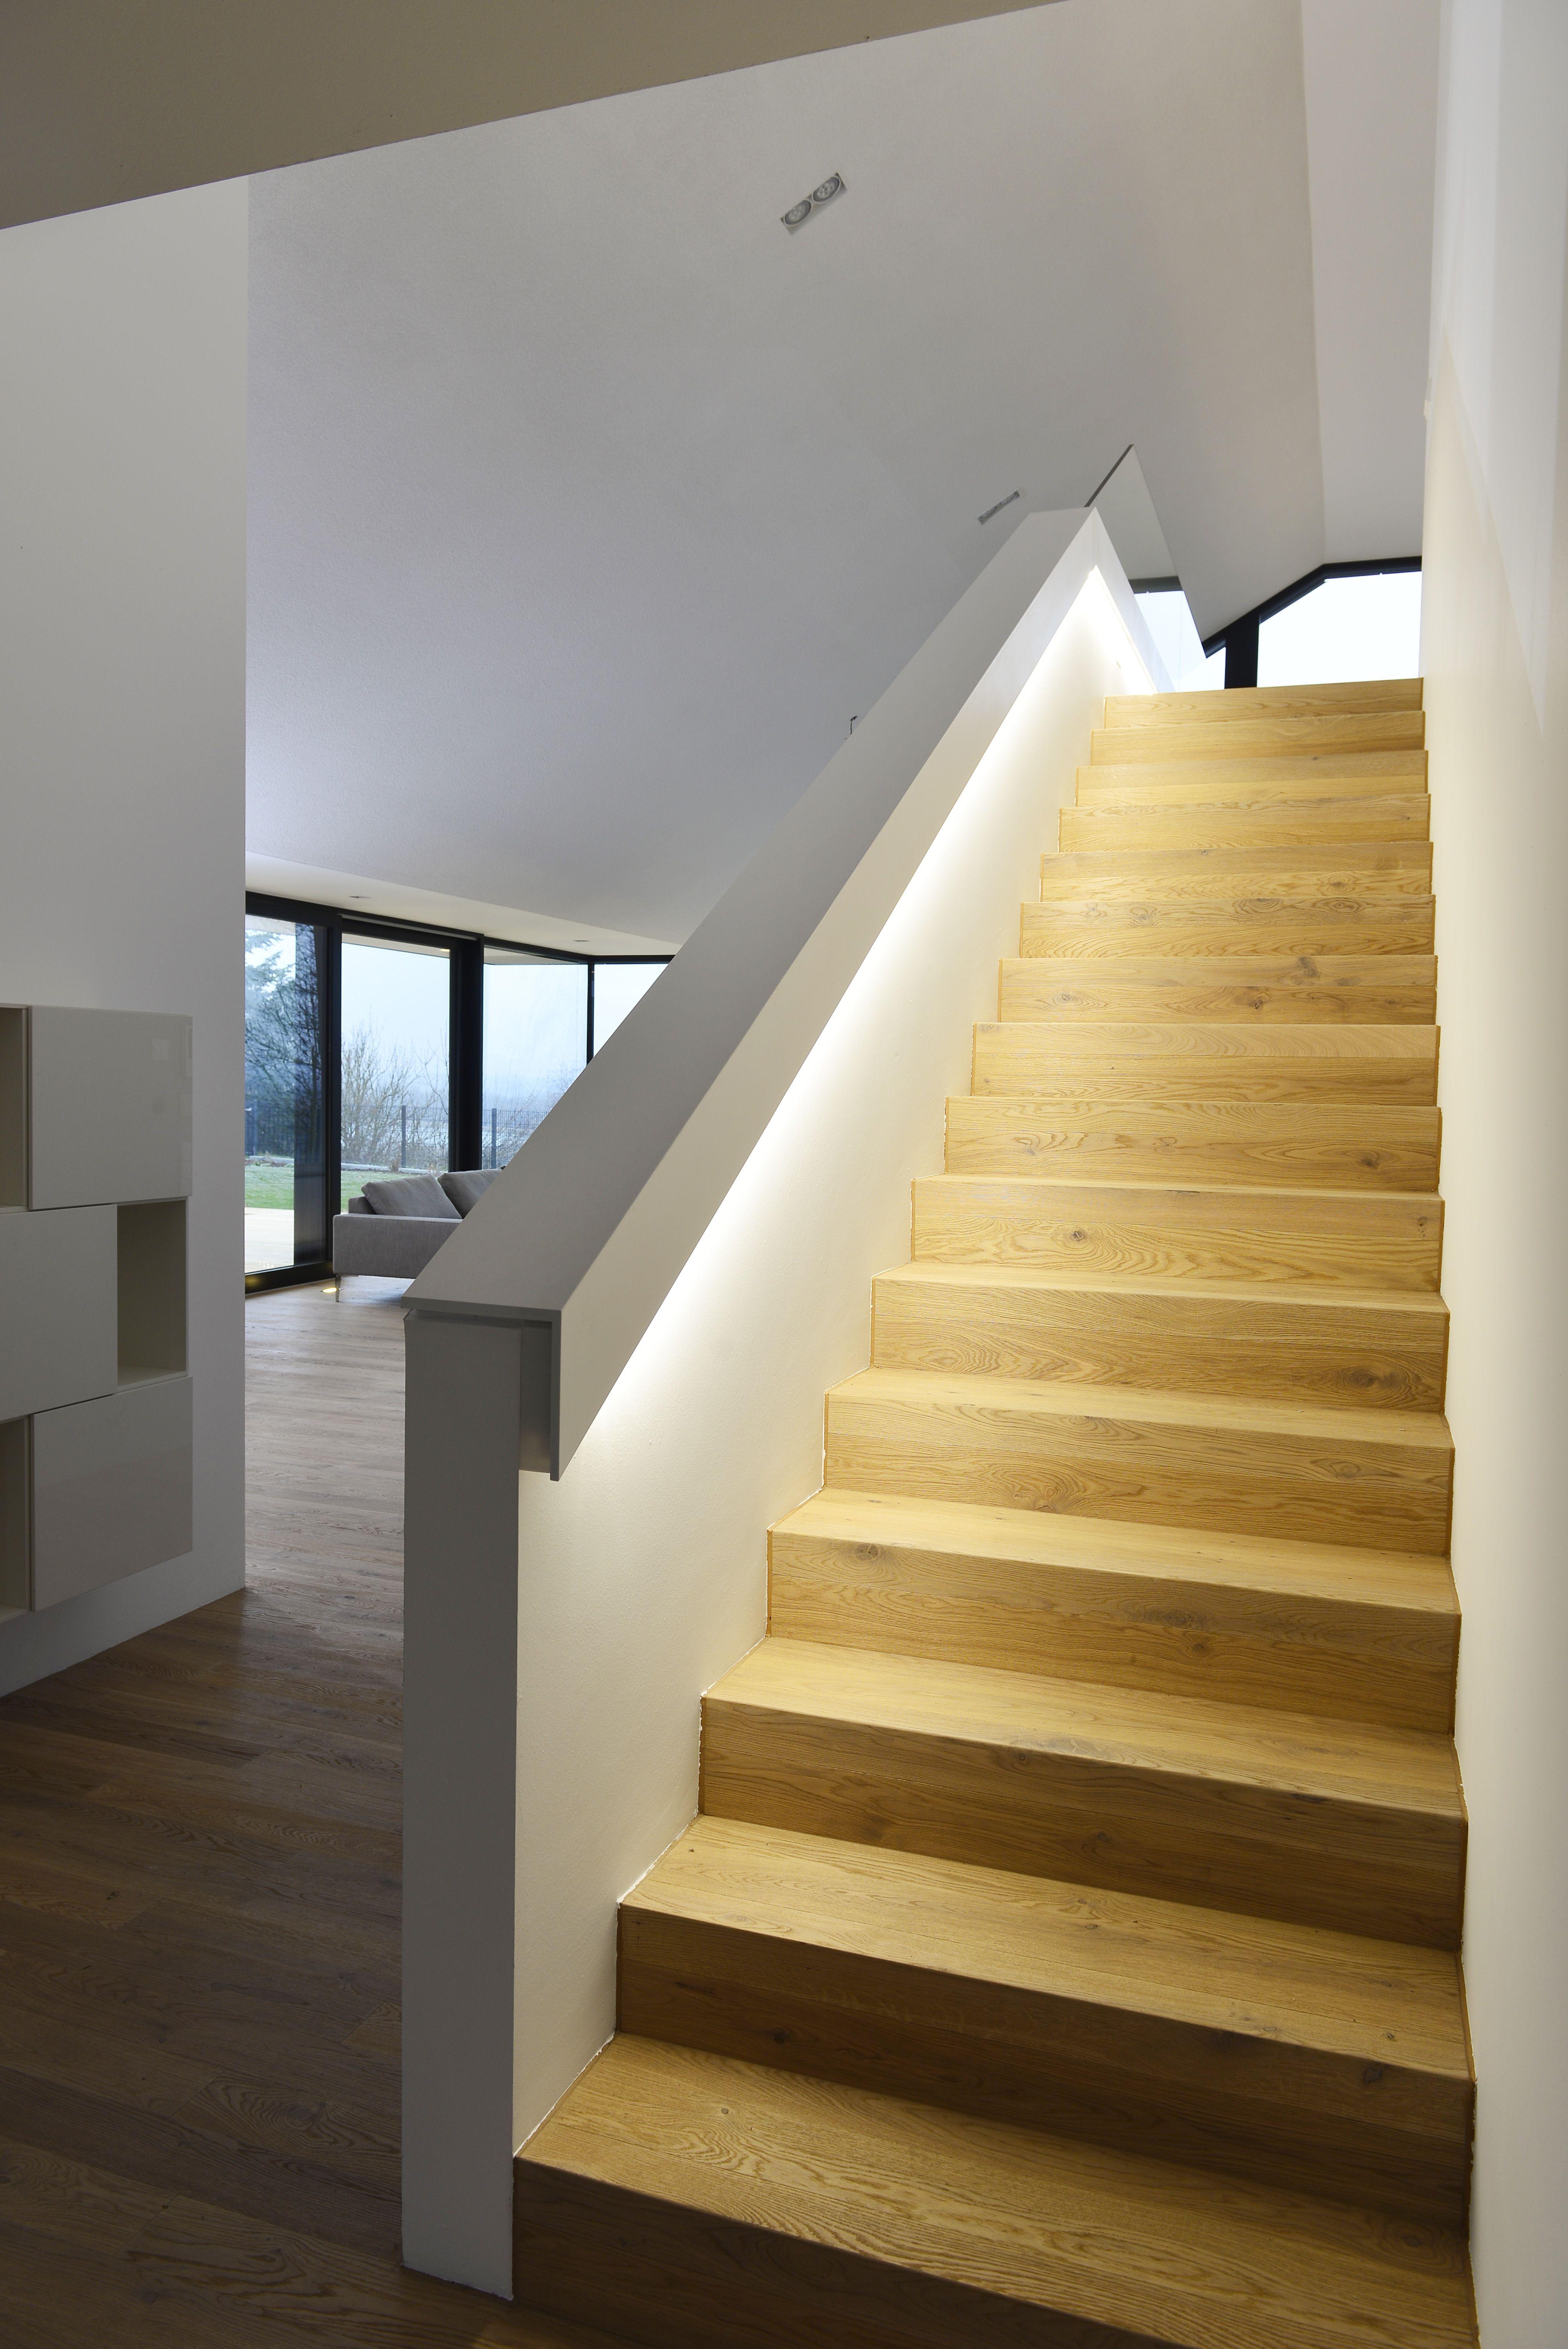 Austria Treppe Haus Moderner Eingang Haus Innenraume